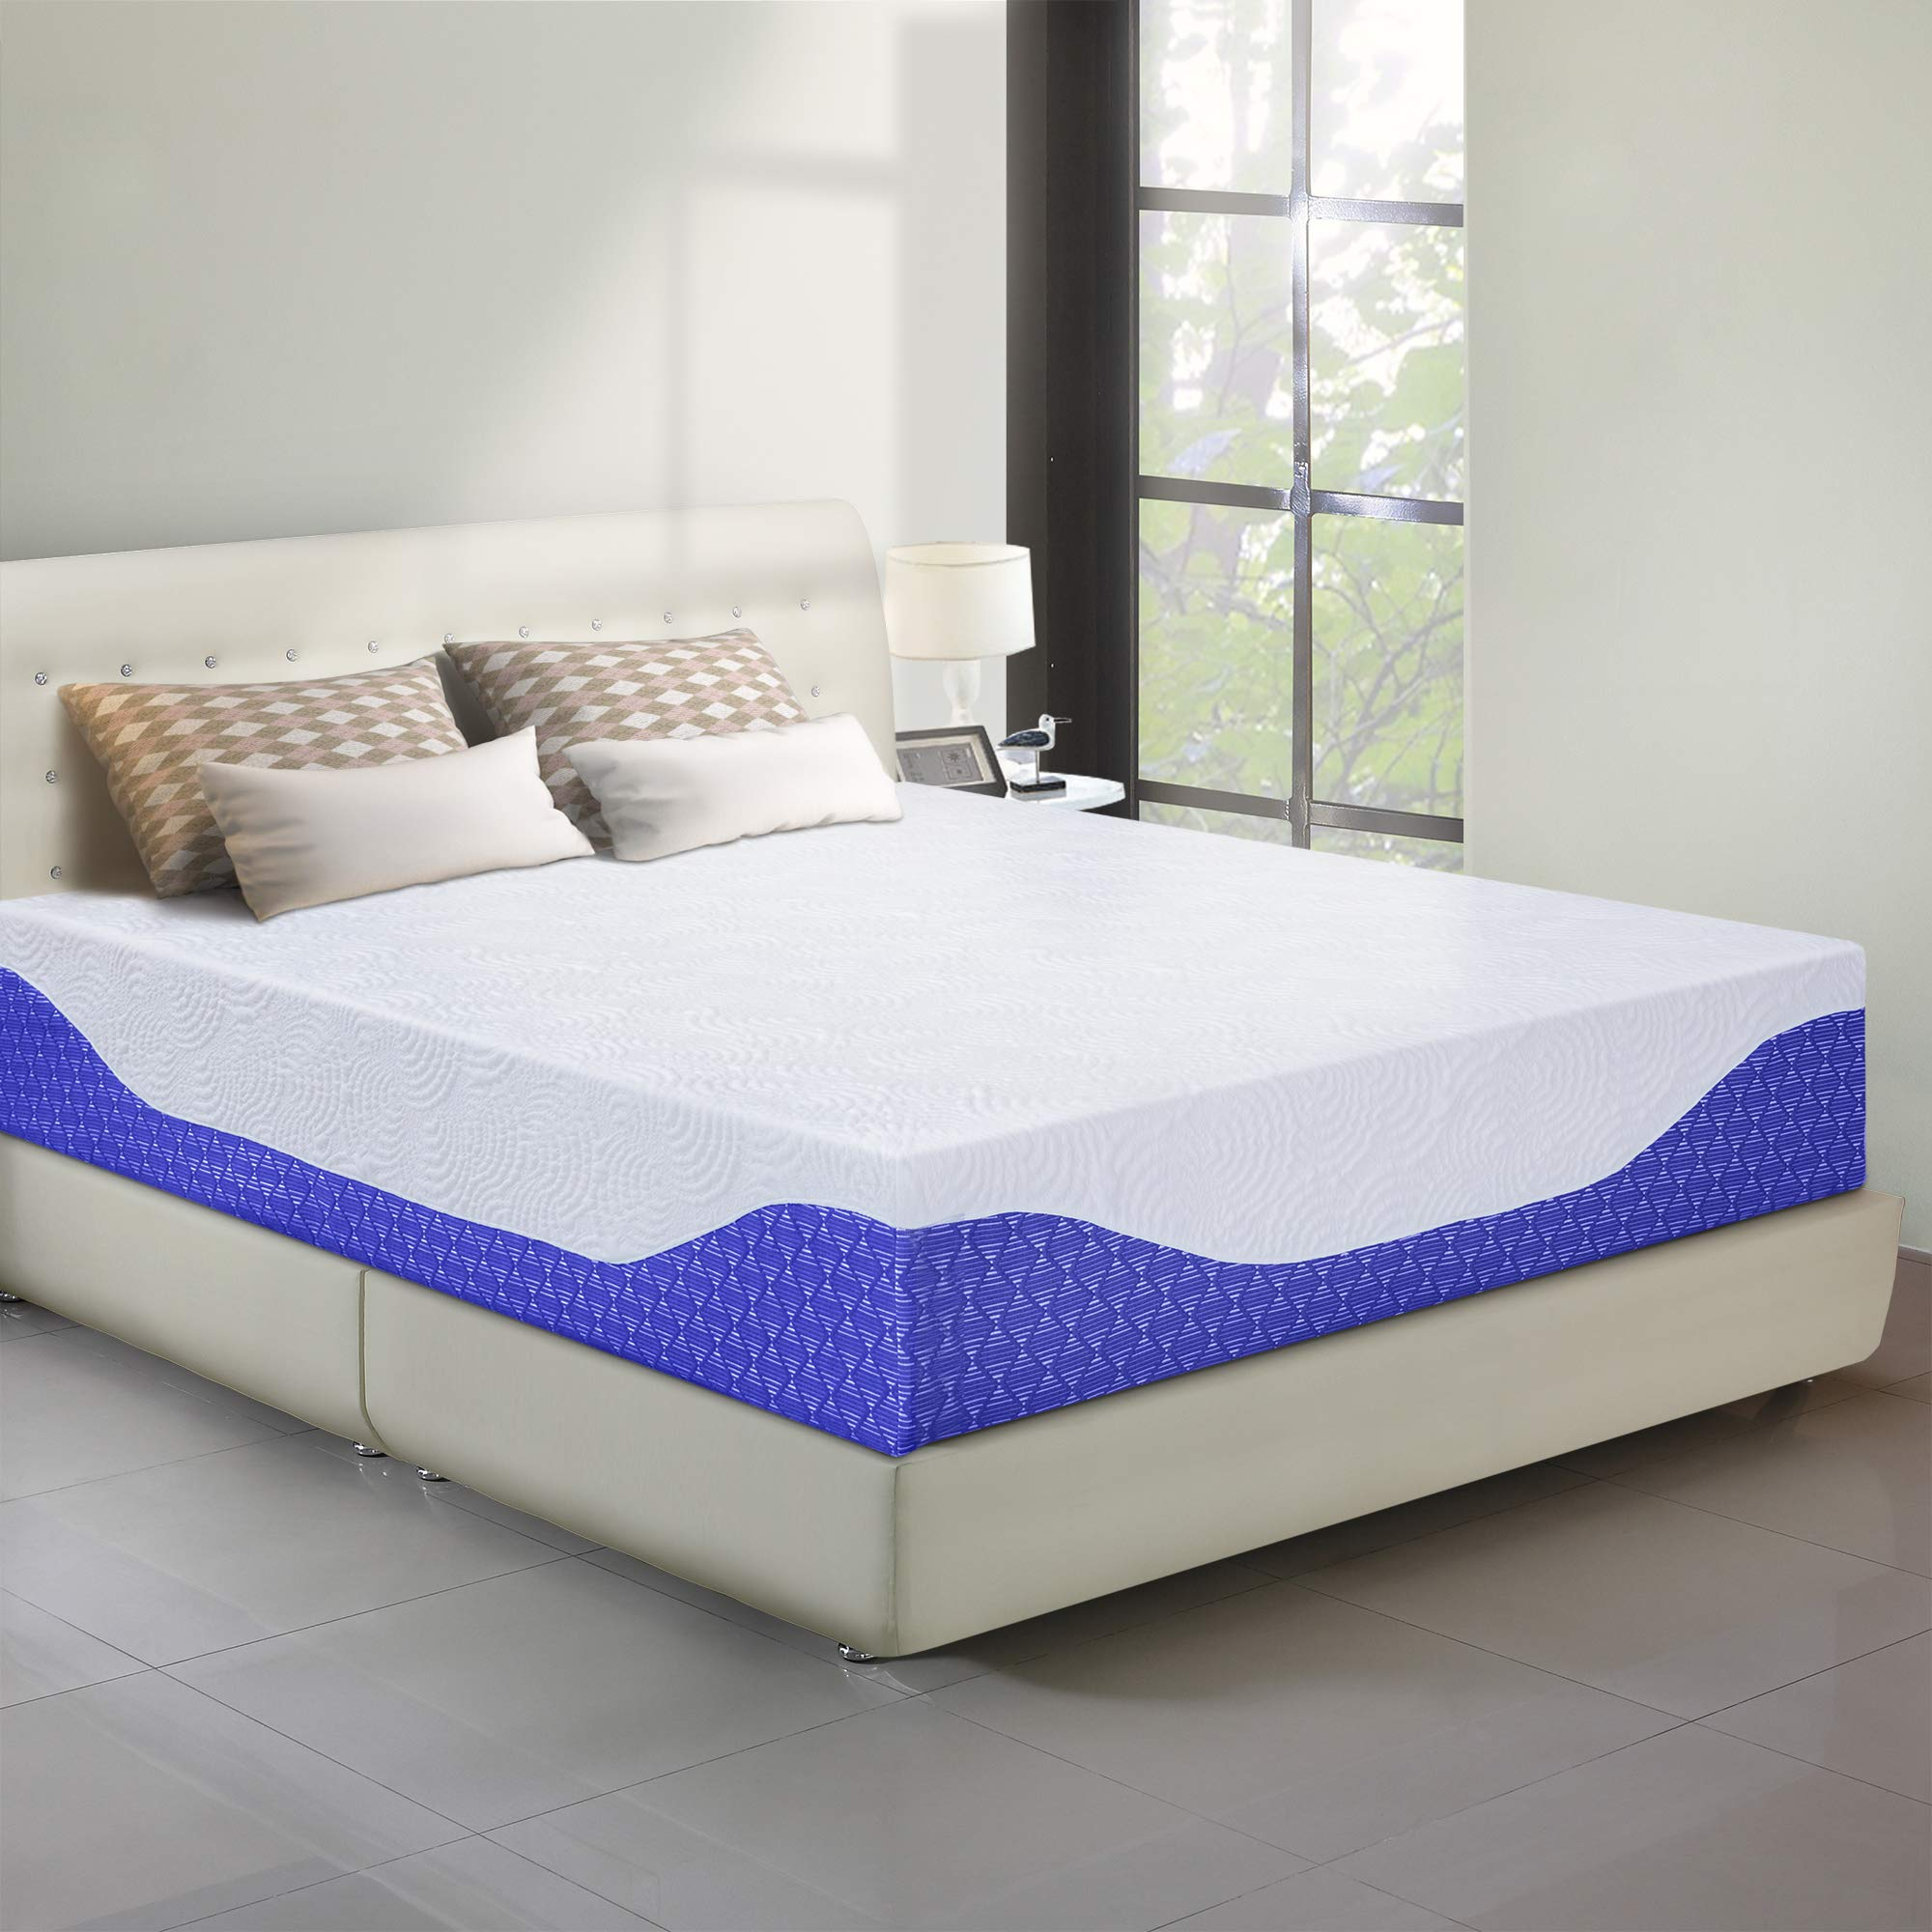 PrimaSleep 12 Inch Multi-Layered I-Gel Infused Memory Foam Mattress/Cobalt Blue/King by PrimaSleep